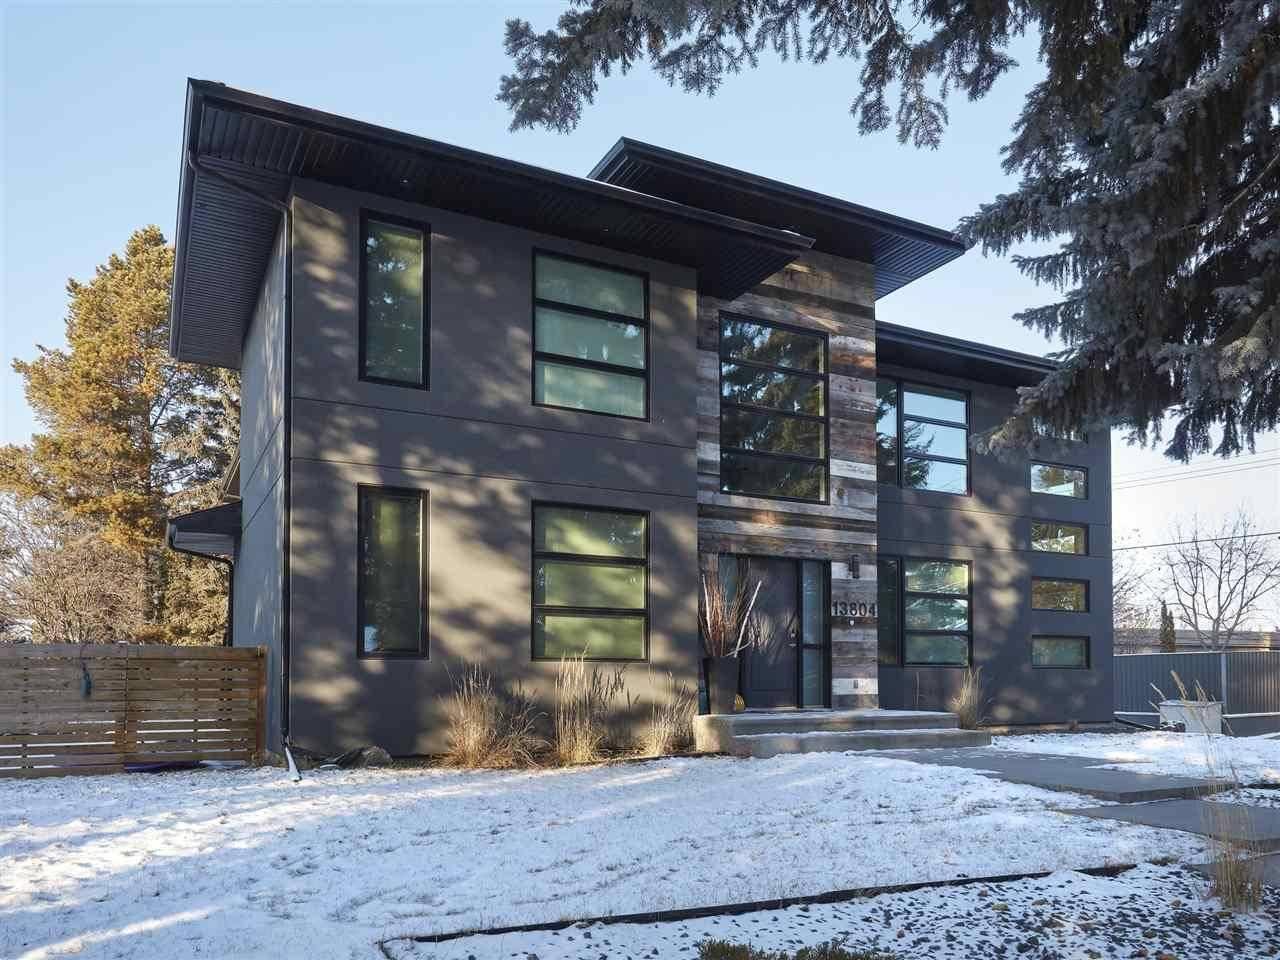 13804 91 Avenue Nw, Edmonton | Image 2